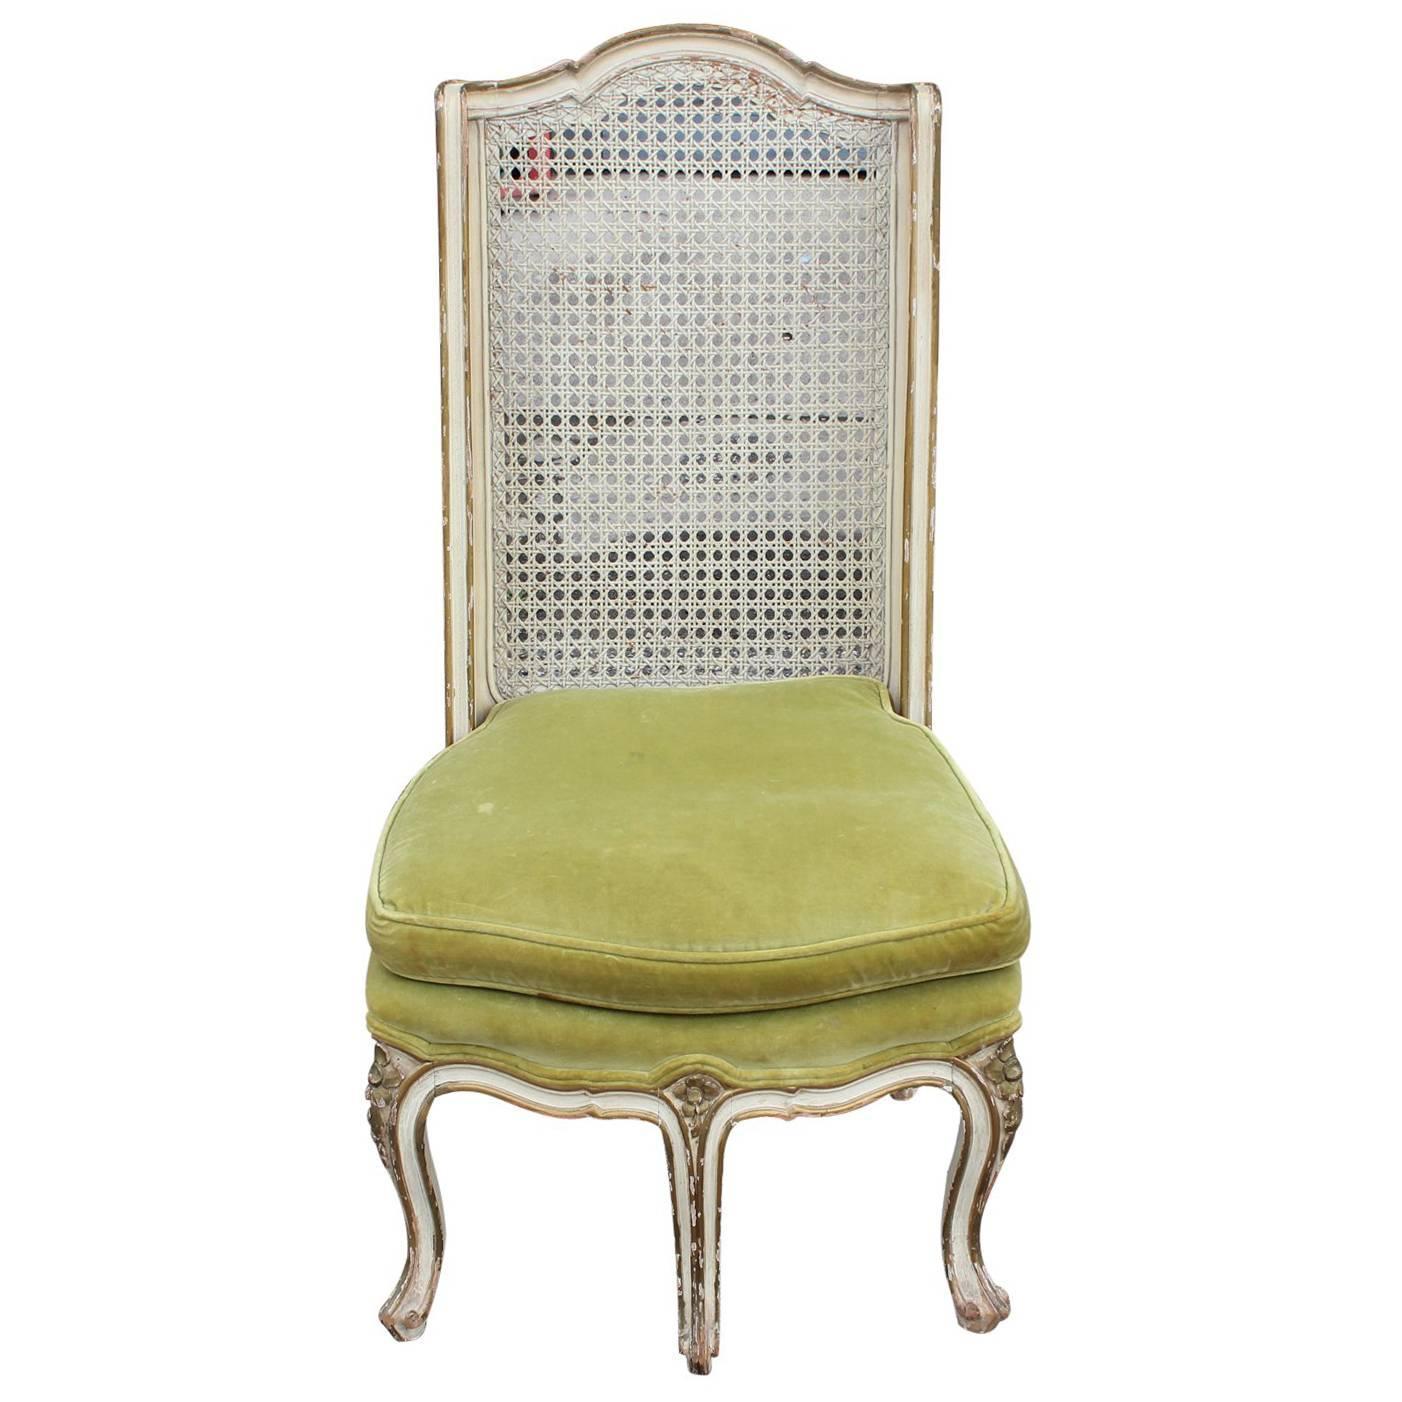 French Louis XIV Five Legged Cane Back Chair in Green Velvet For